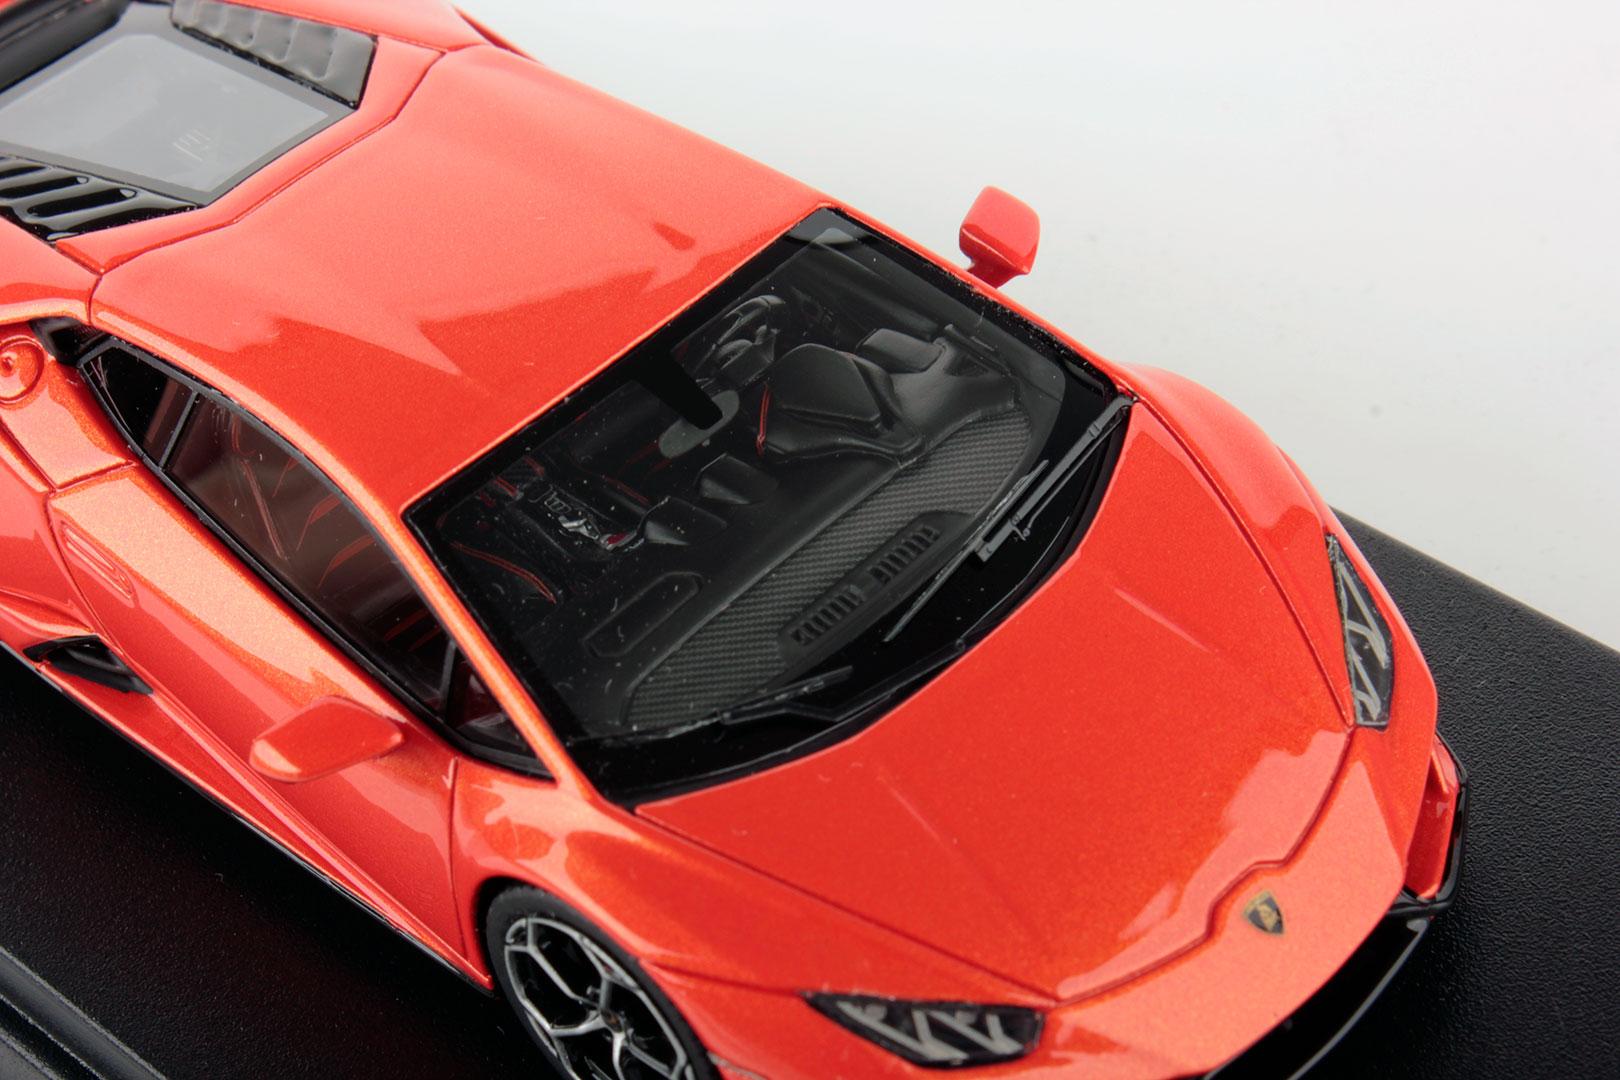 Lamborghini Huracan Evo miniature (7)